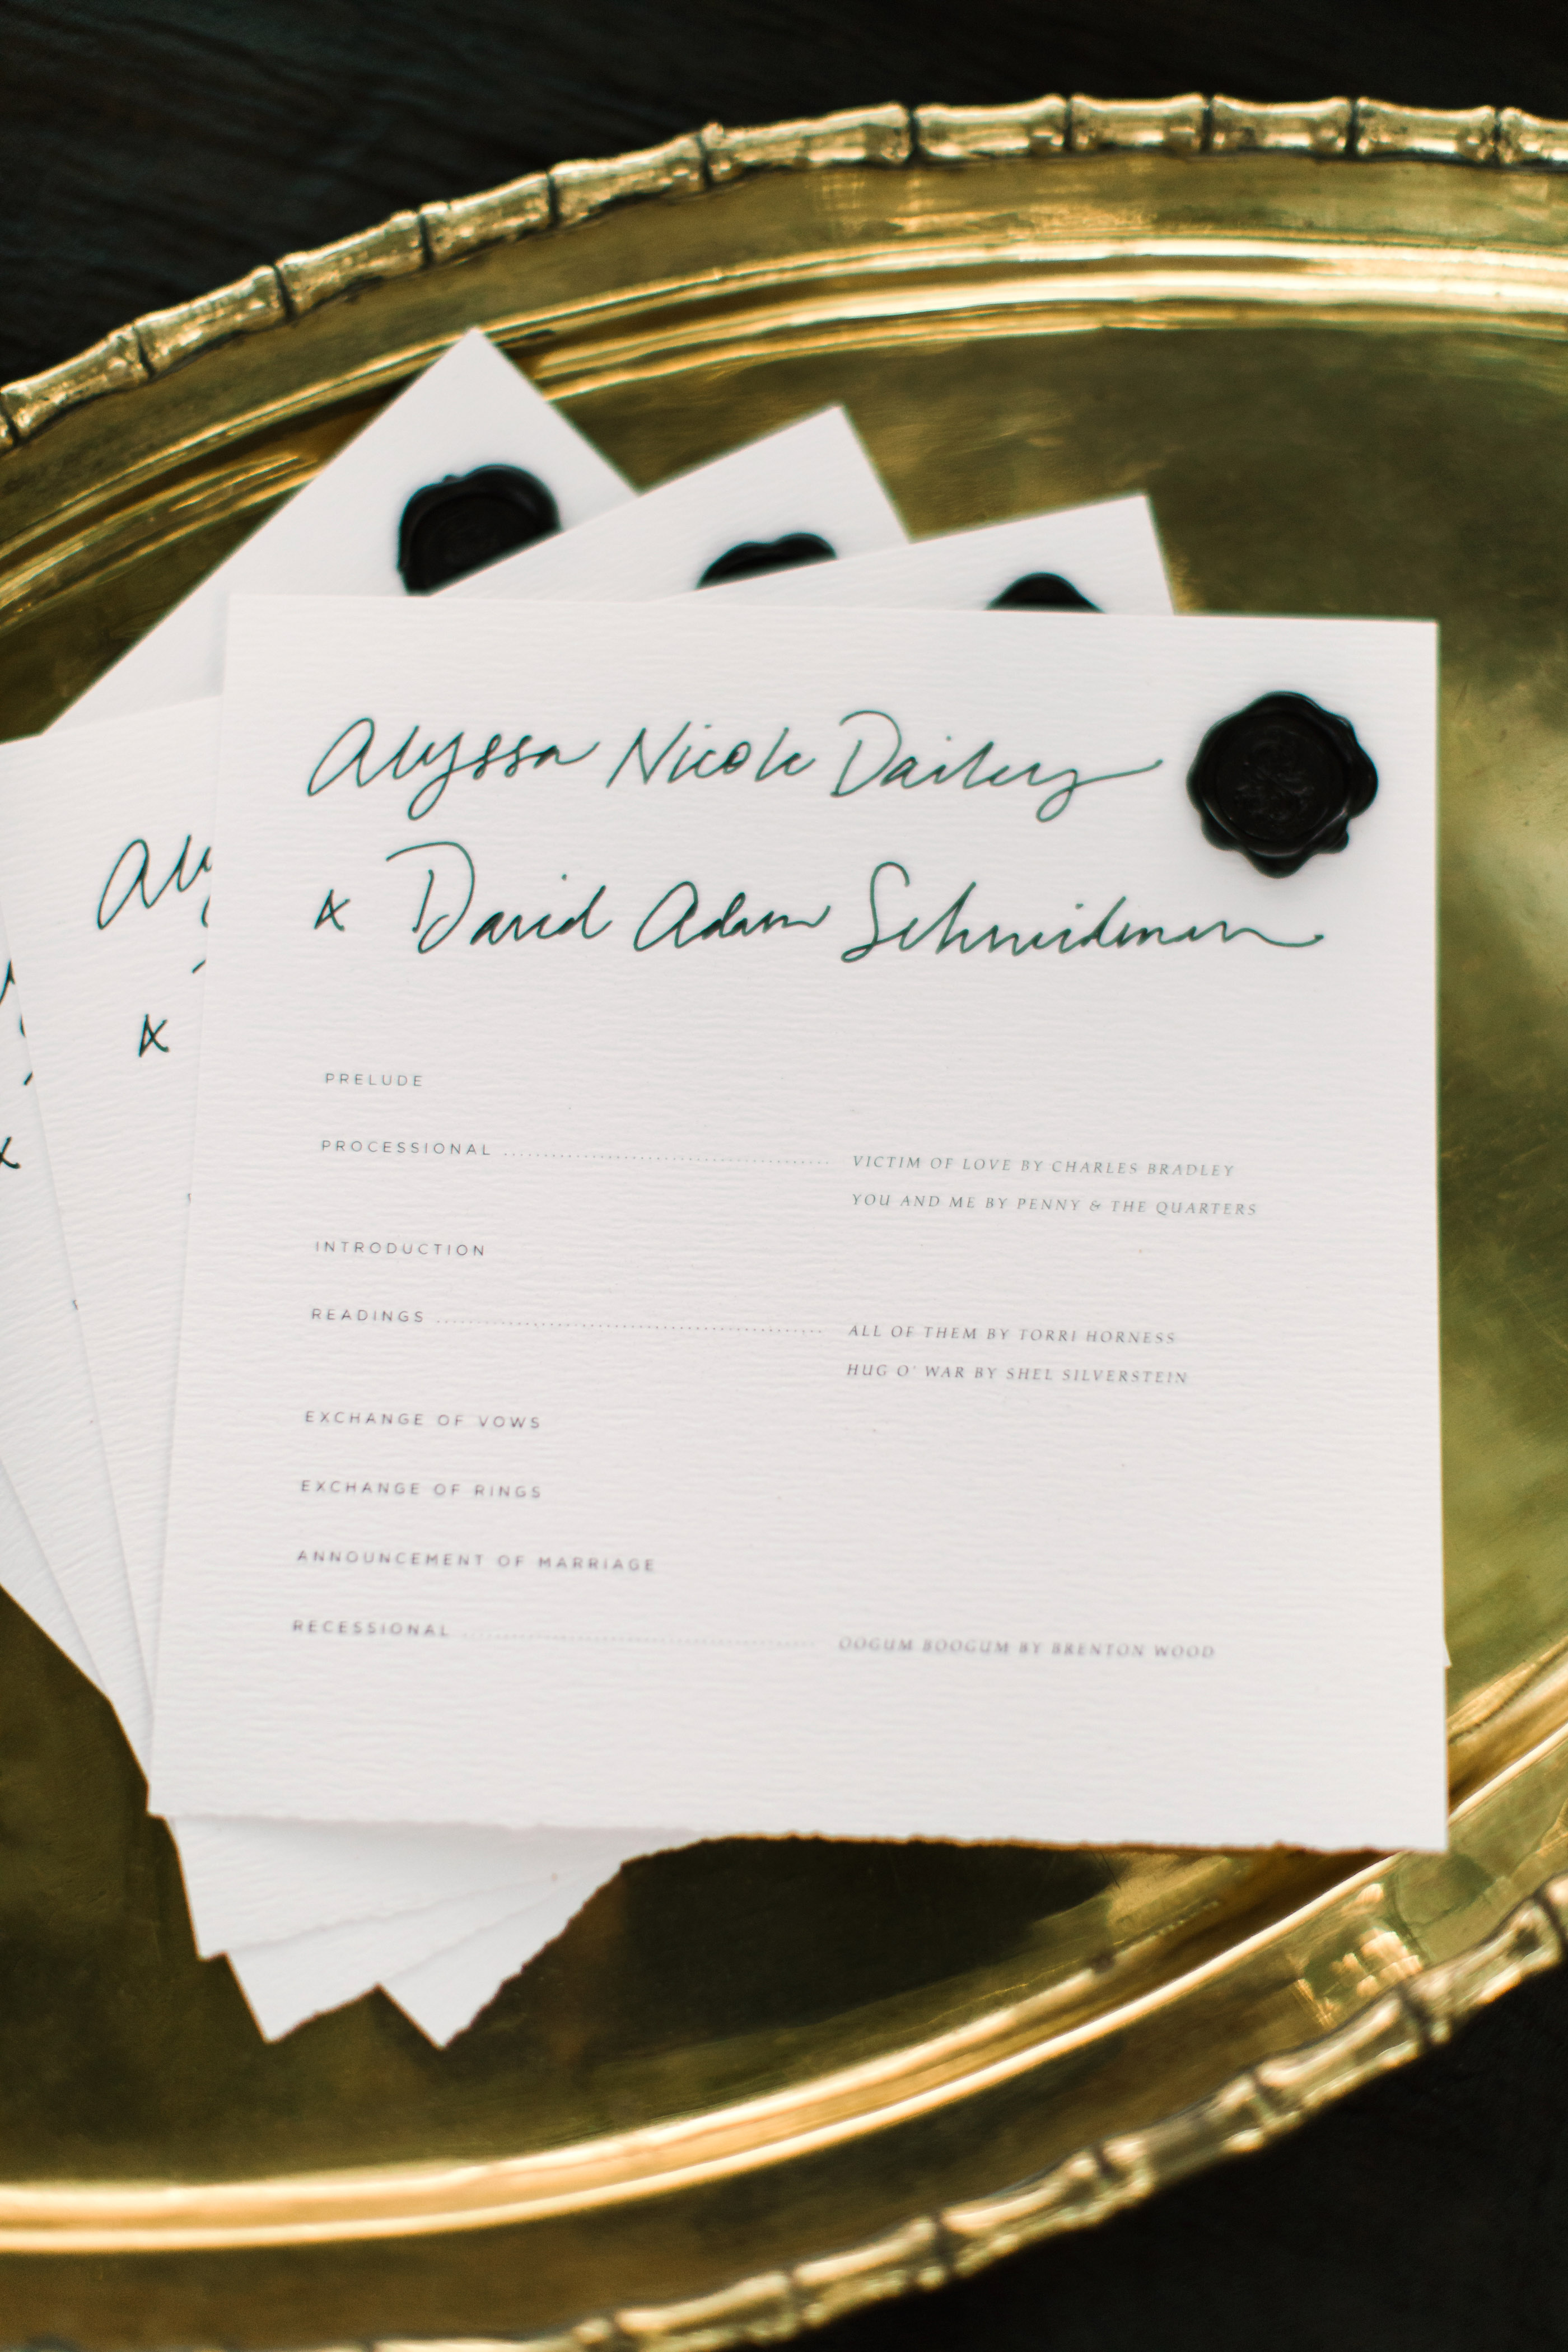 wedding programs on gold tray